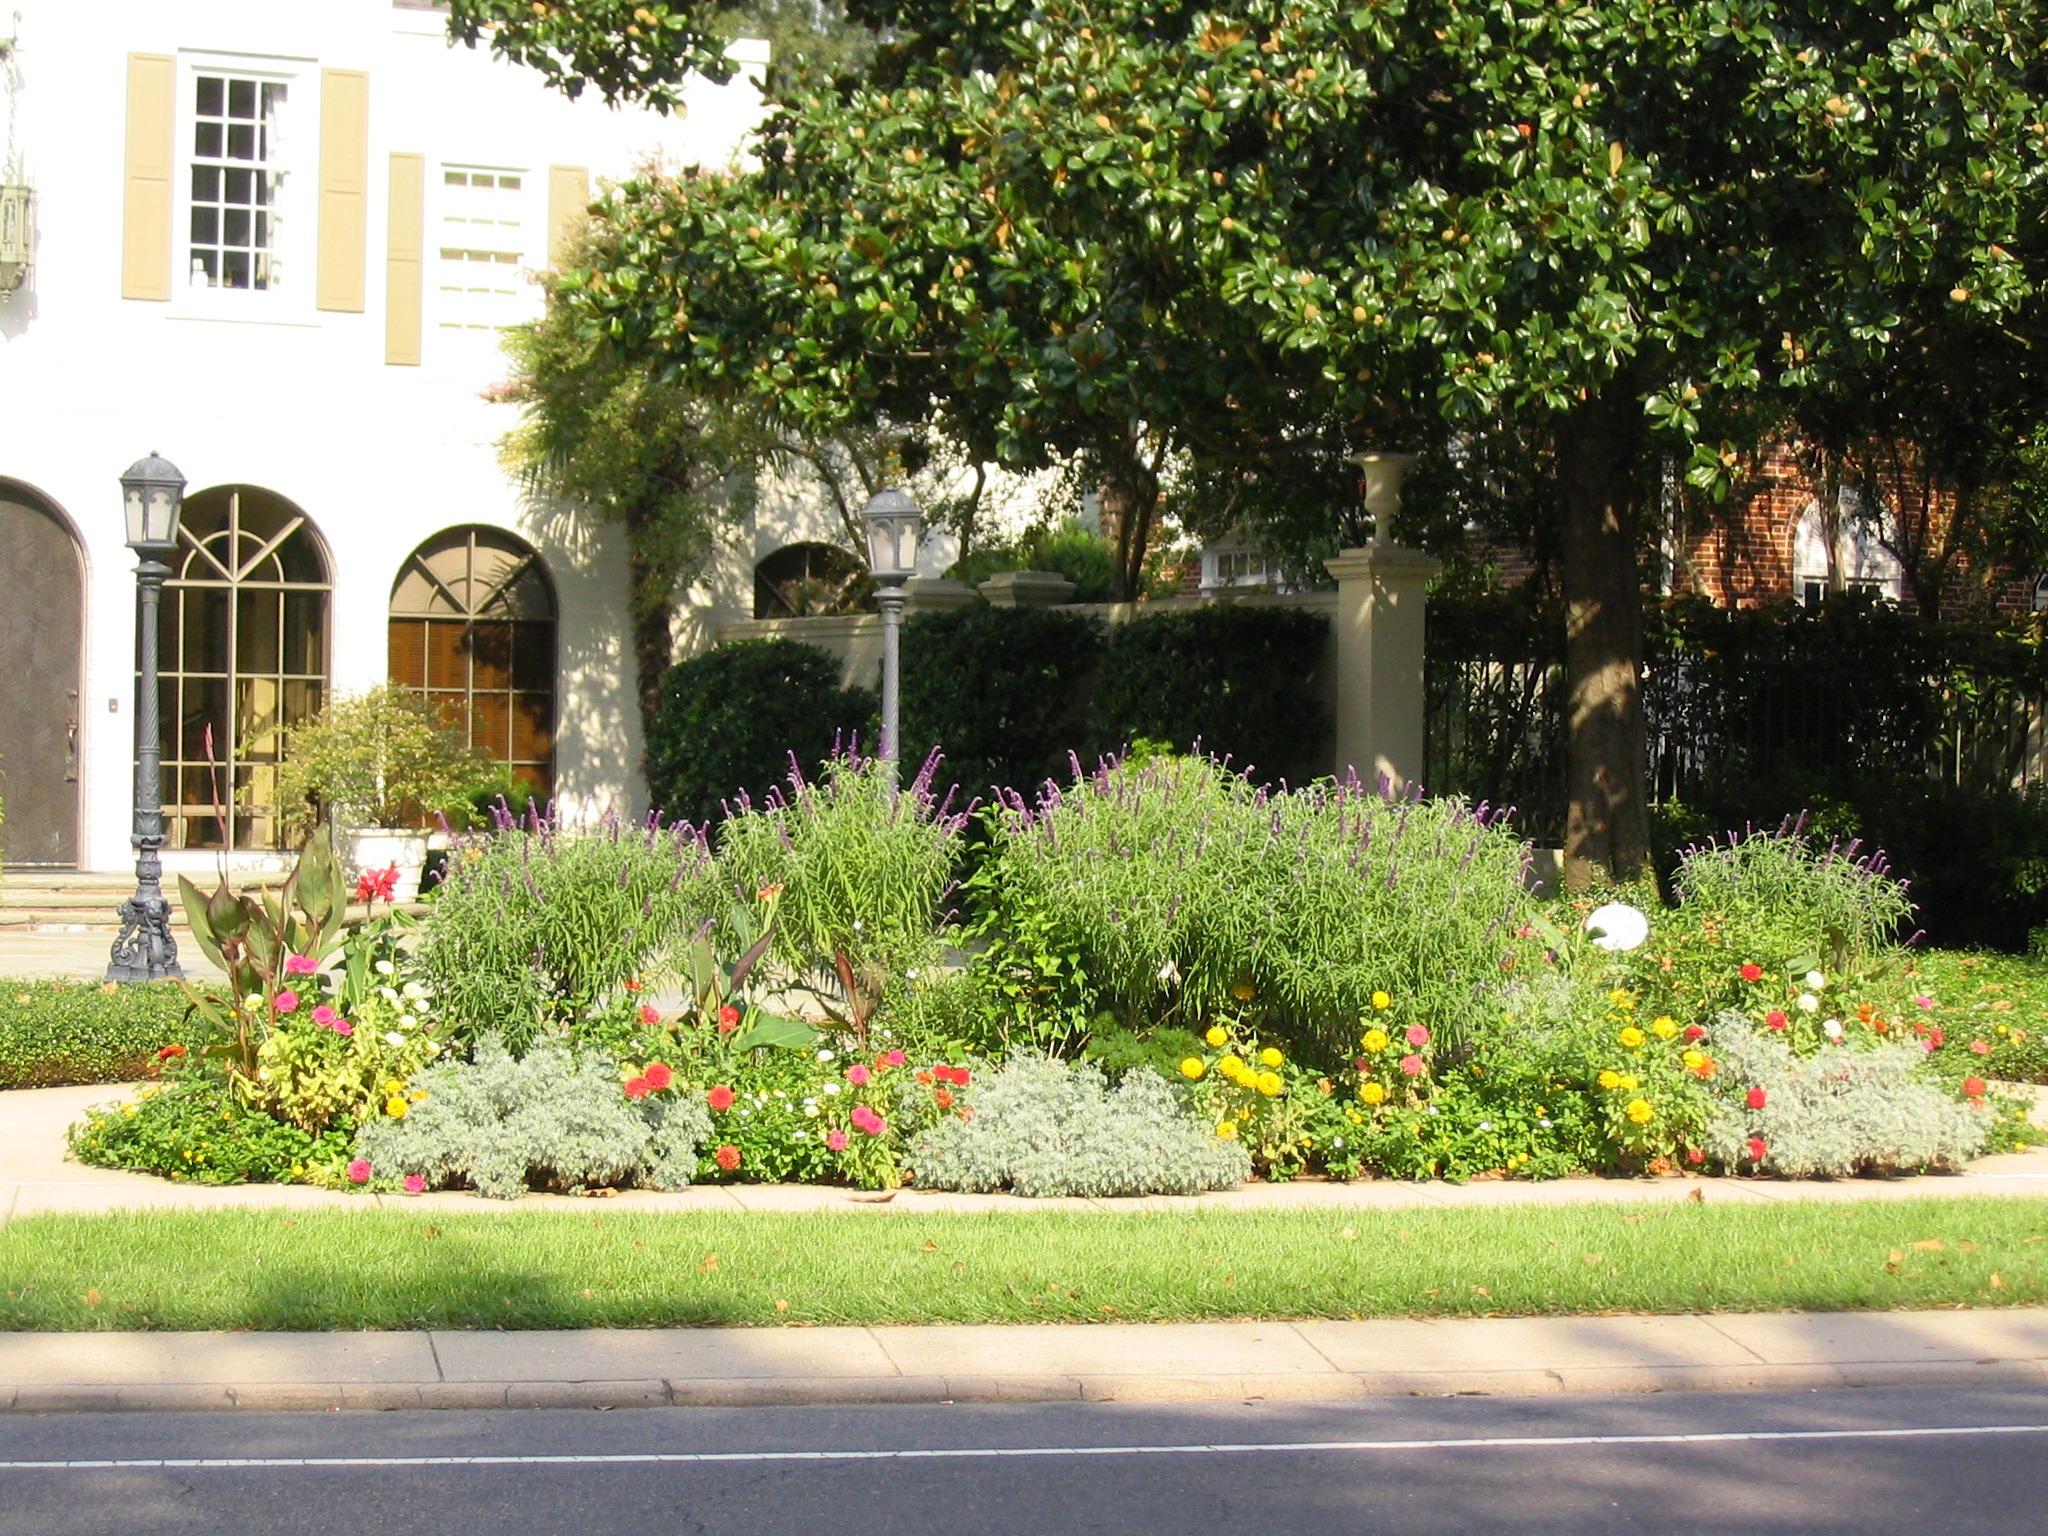 Plan Summer Flower Gardens Now